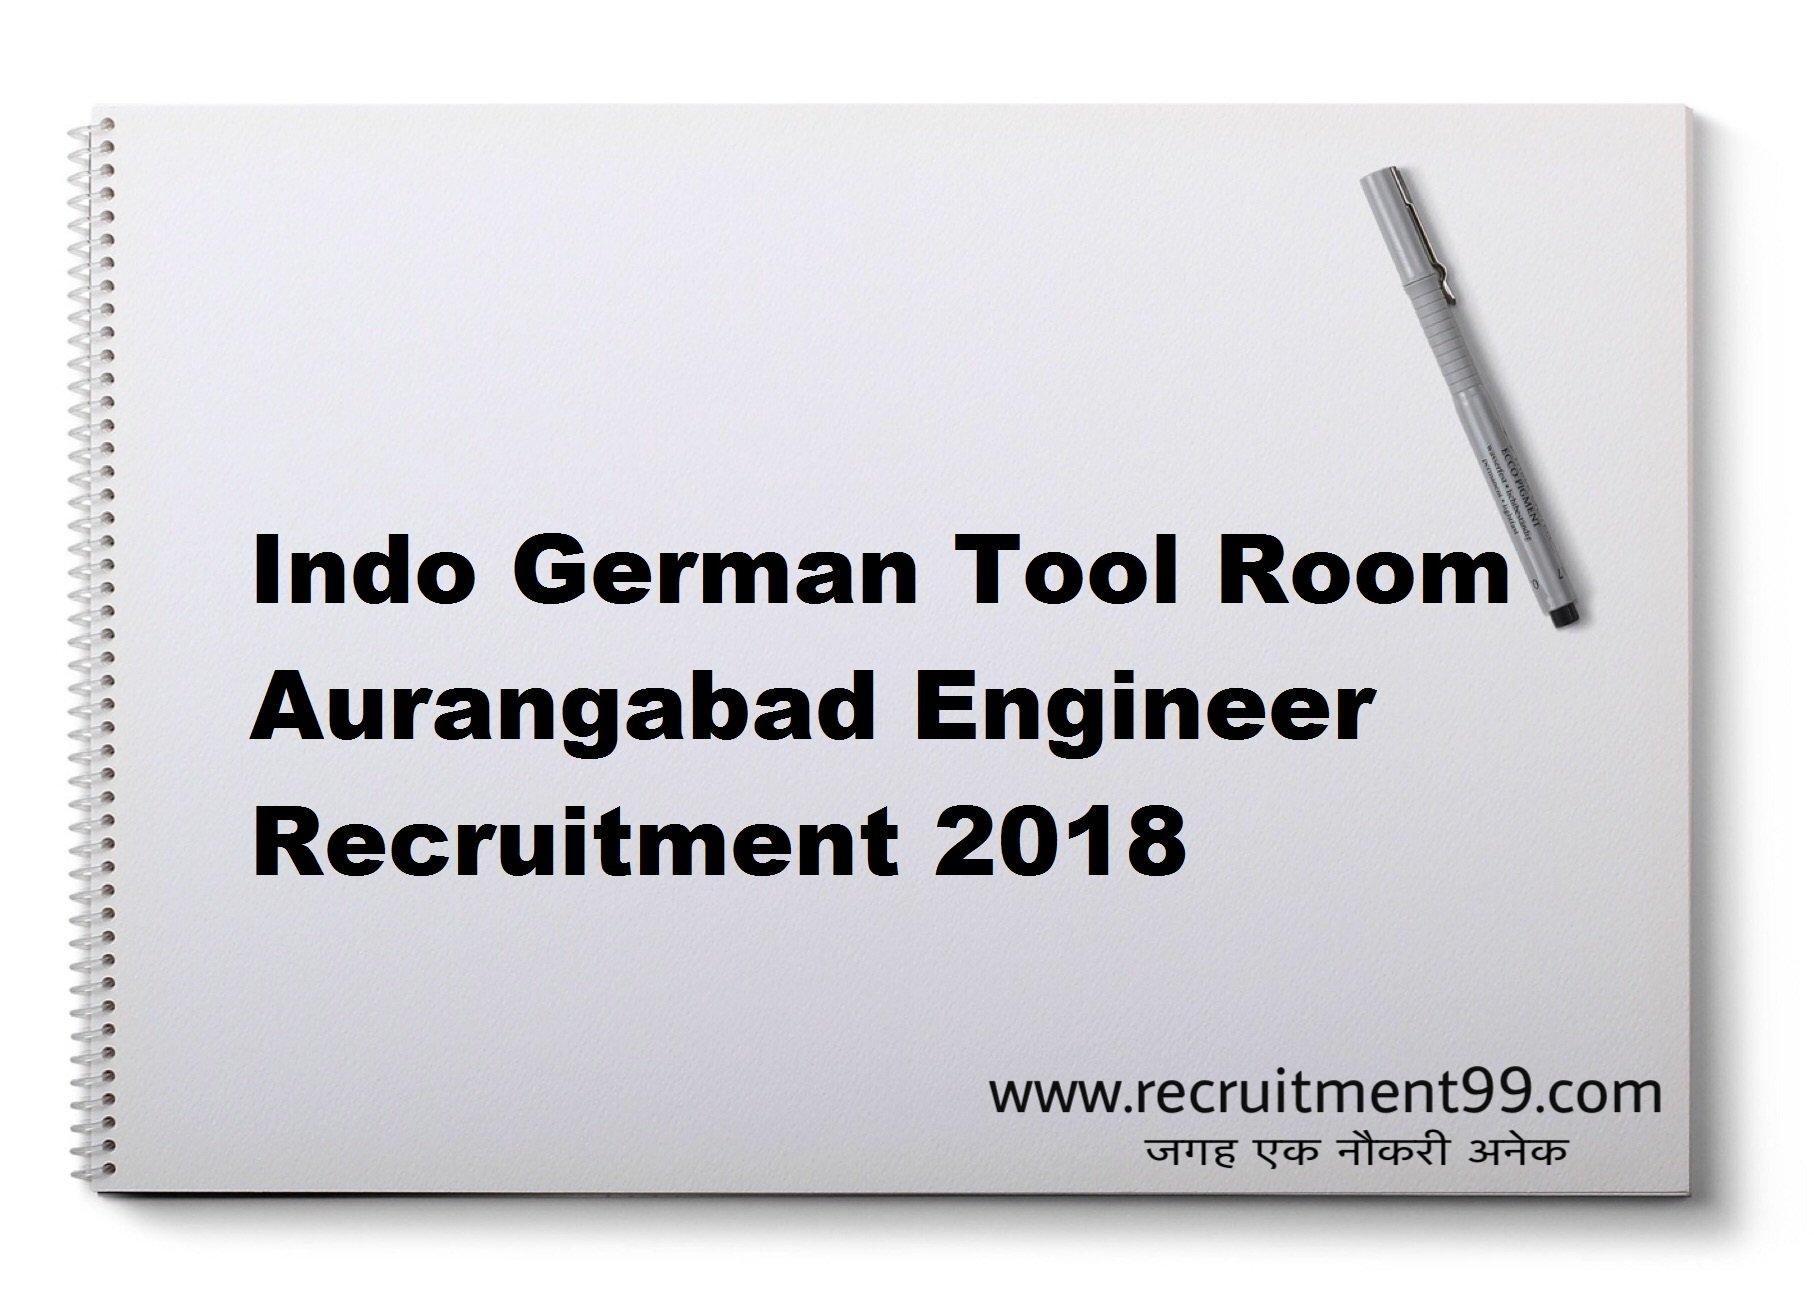 Indo German Tool Room Aurangabad Engineer Recruitment Admit Card Result 2018